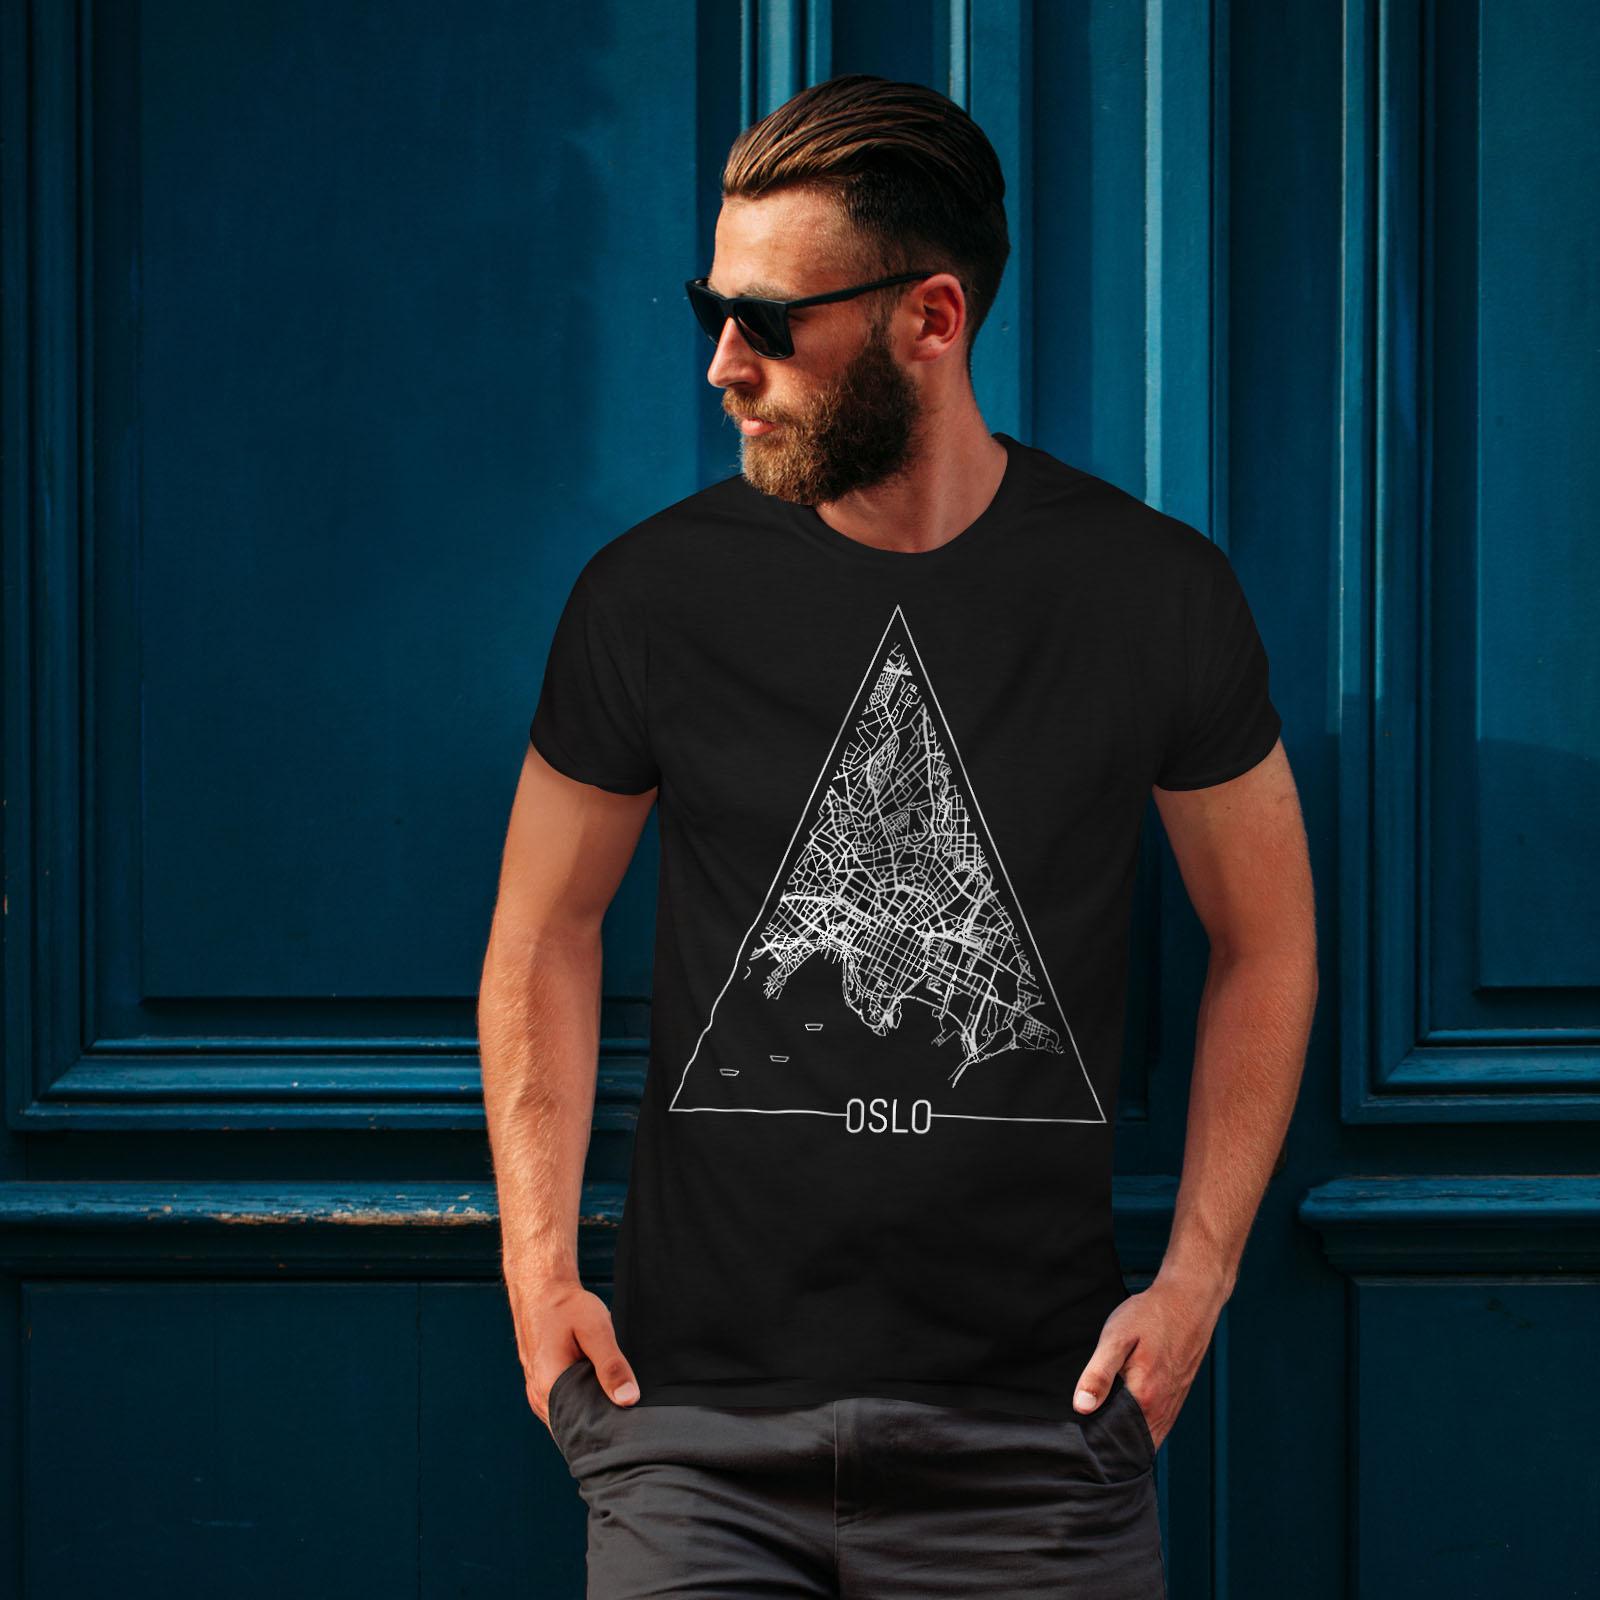 Wellcoda-Norvegia-Big-City-Oslo-da-uomo-T-shirt-Citta-design-grafico-stampato-T-shirt miniatura 4